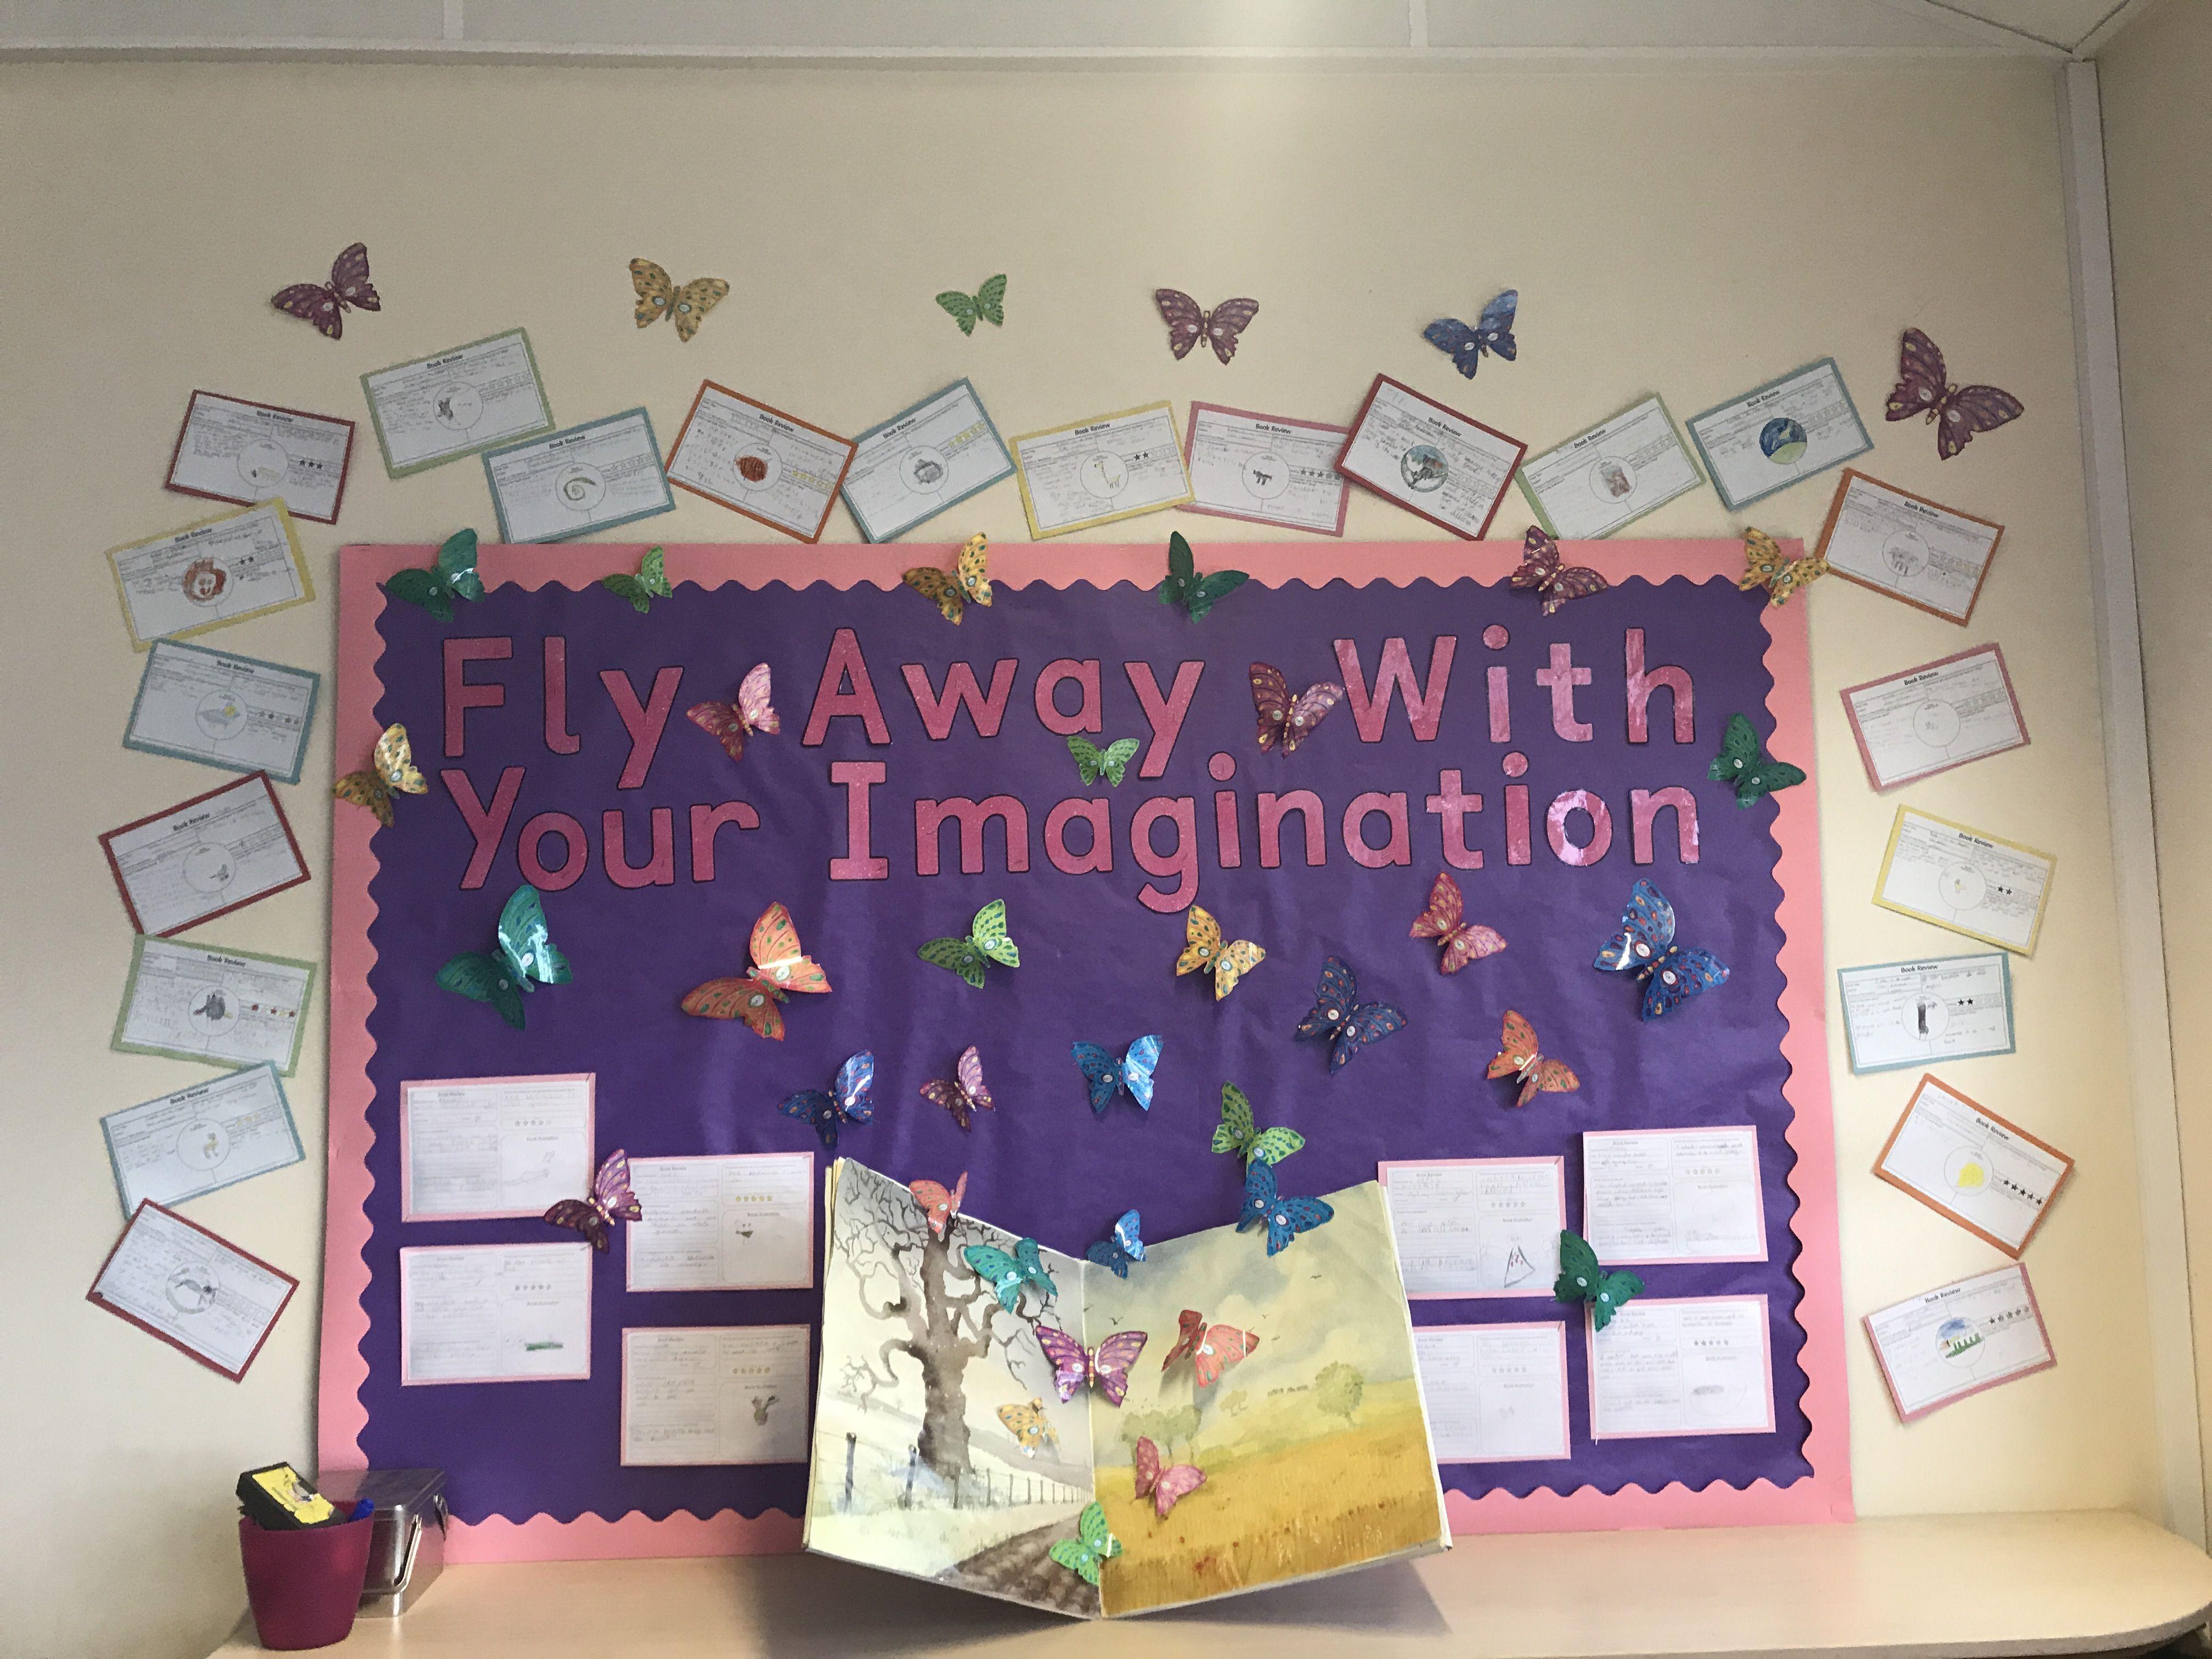 Book Corner Display Ks1 Classroom Year 2 Imagination